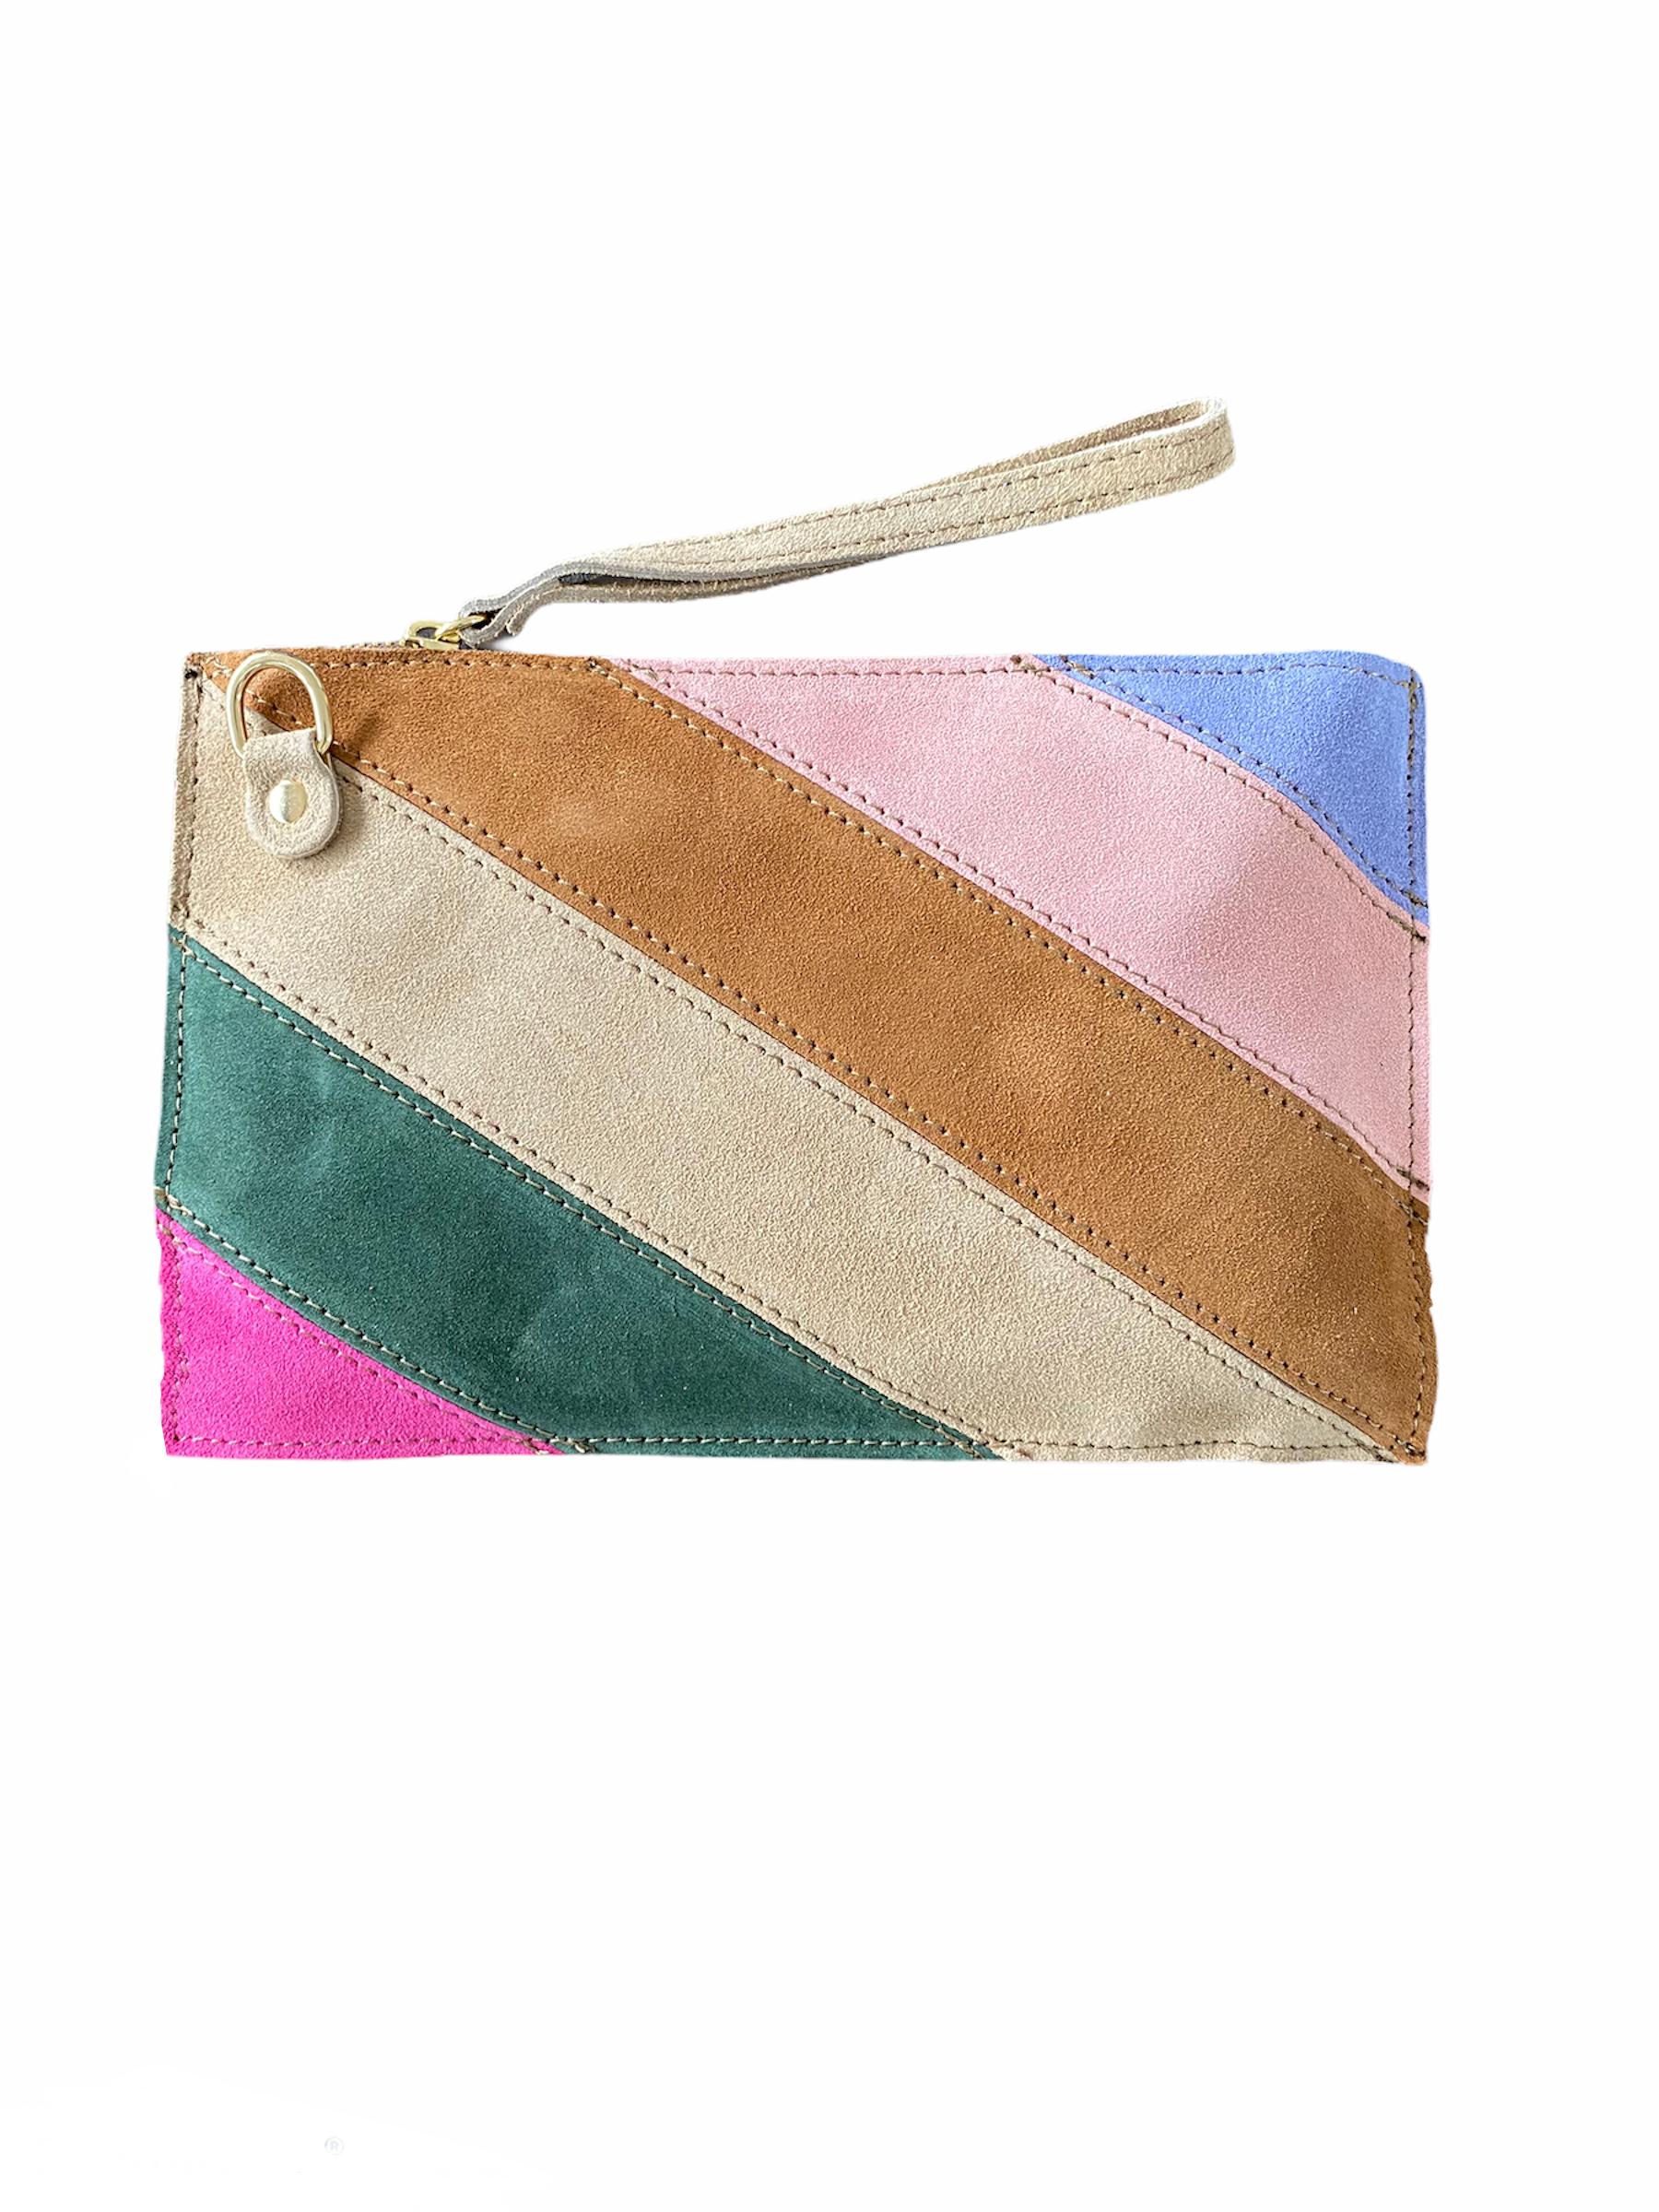 Suède -Clutch--Rainbow-bruin fuchsia beige groen-look-a-like-it-bags-regenboogkleuren-giuliano-bestellen-kopen